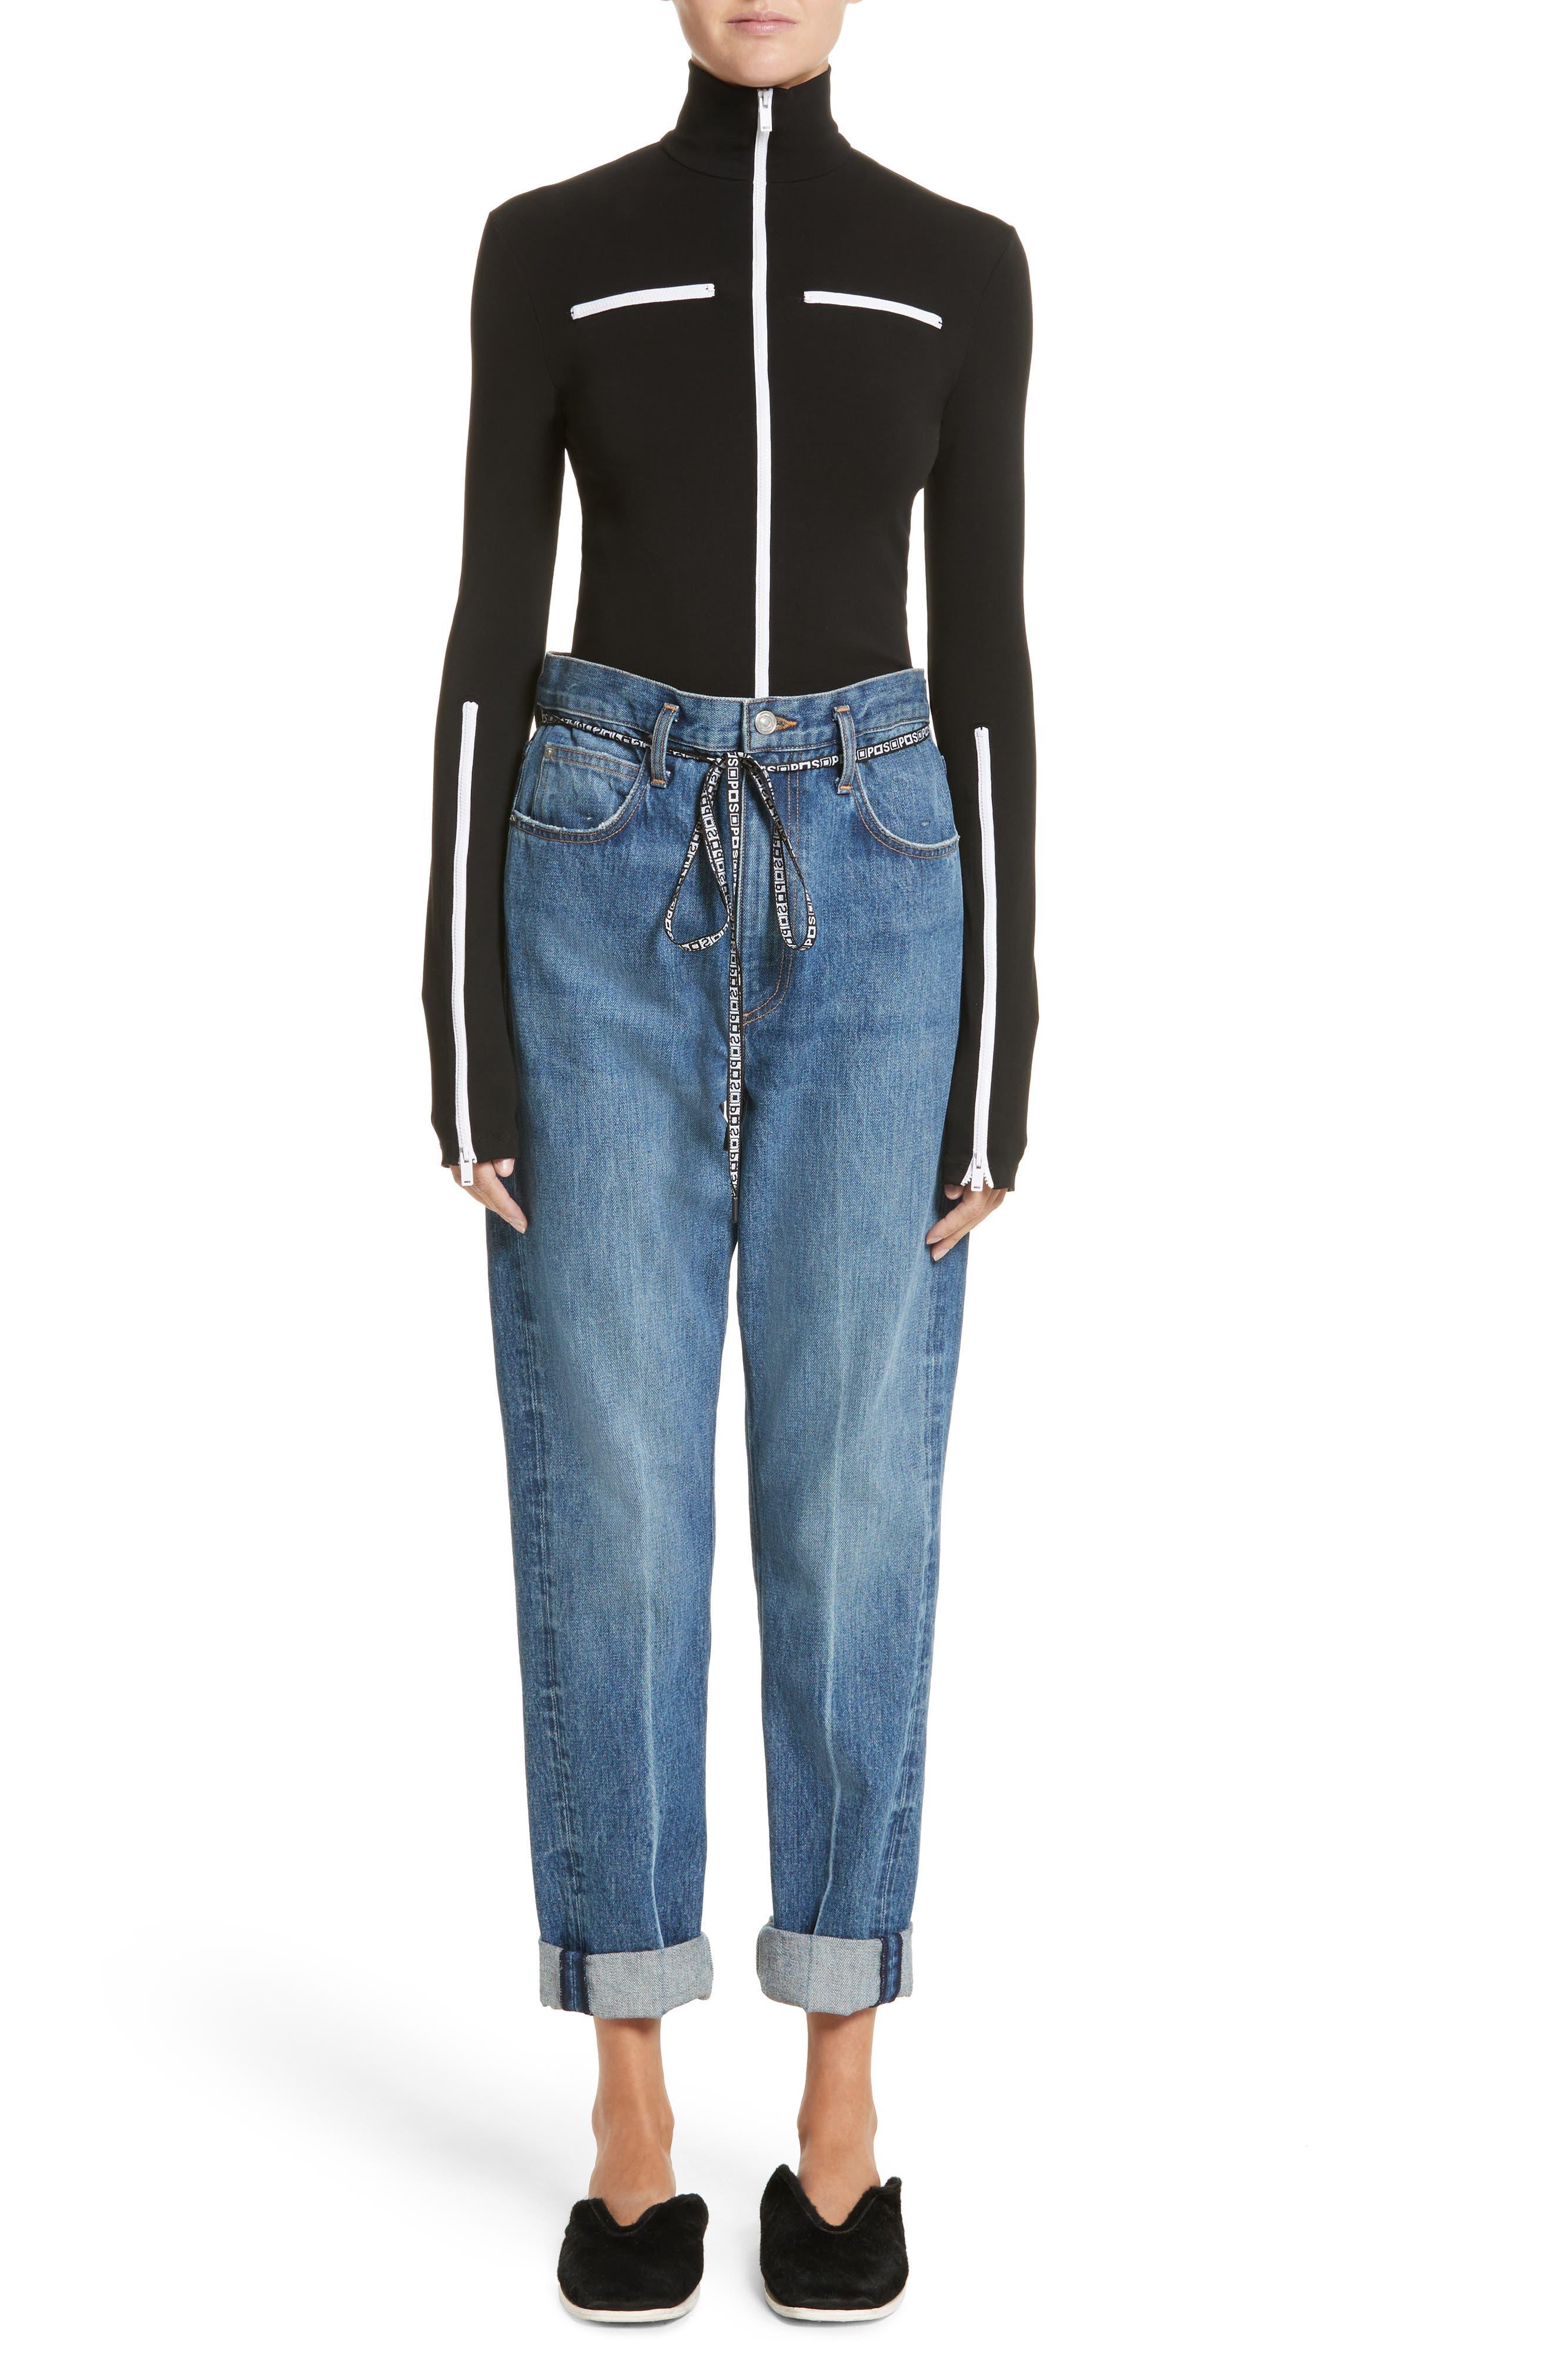 PSWL Cuffed Straight Leg Jeans,                             Alternate thumbnail 10, color,                             Medium Blue